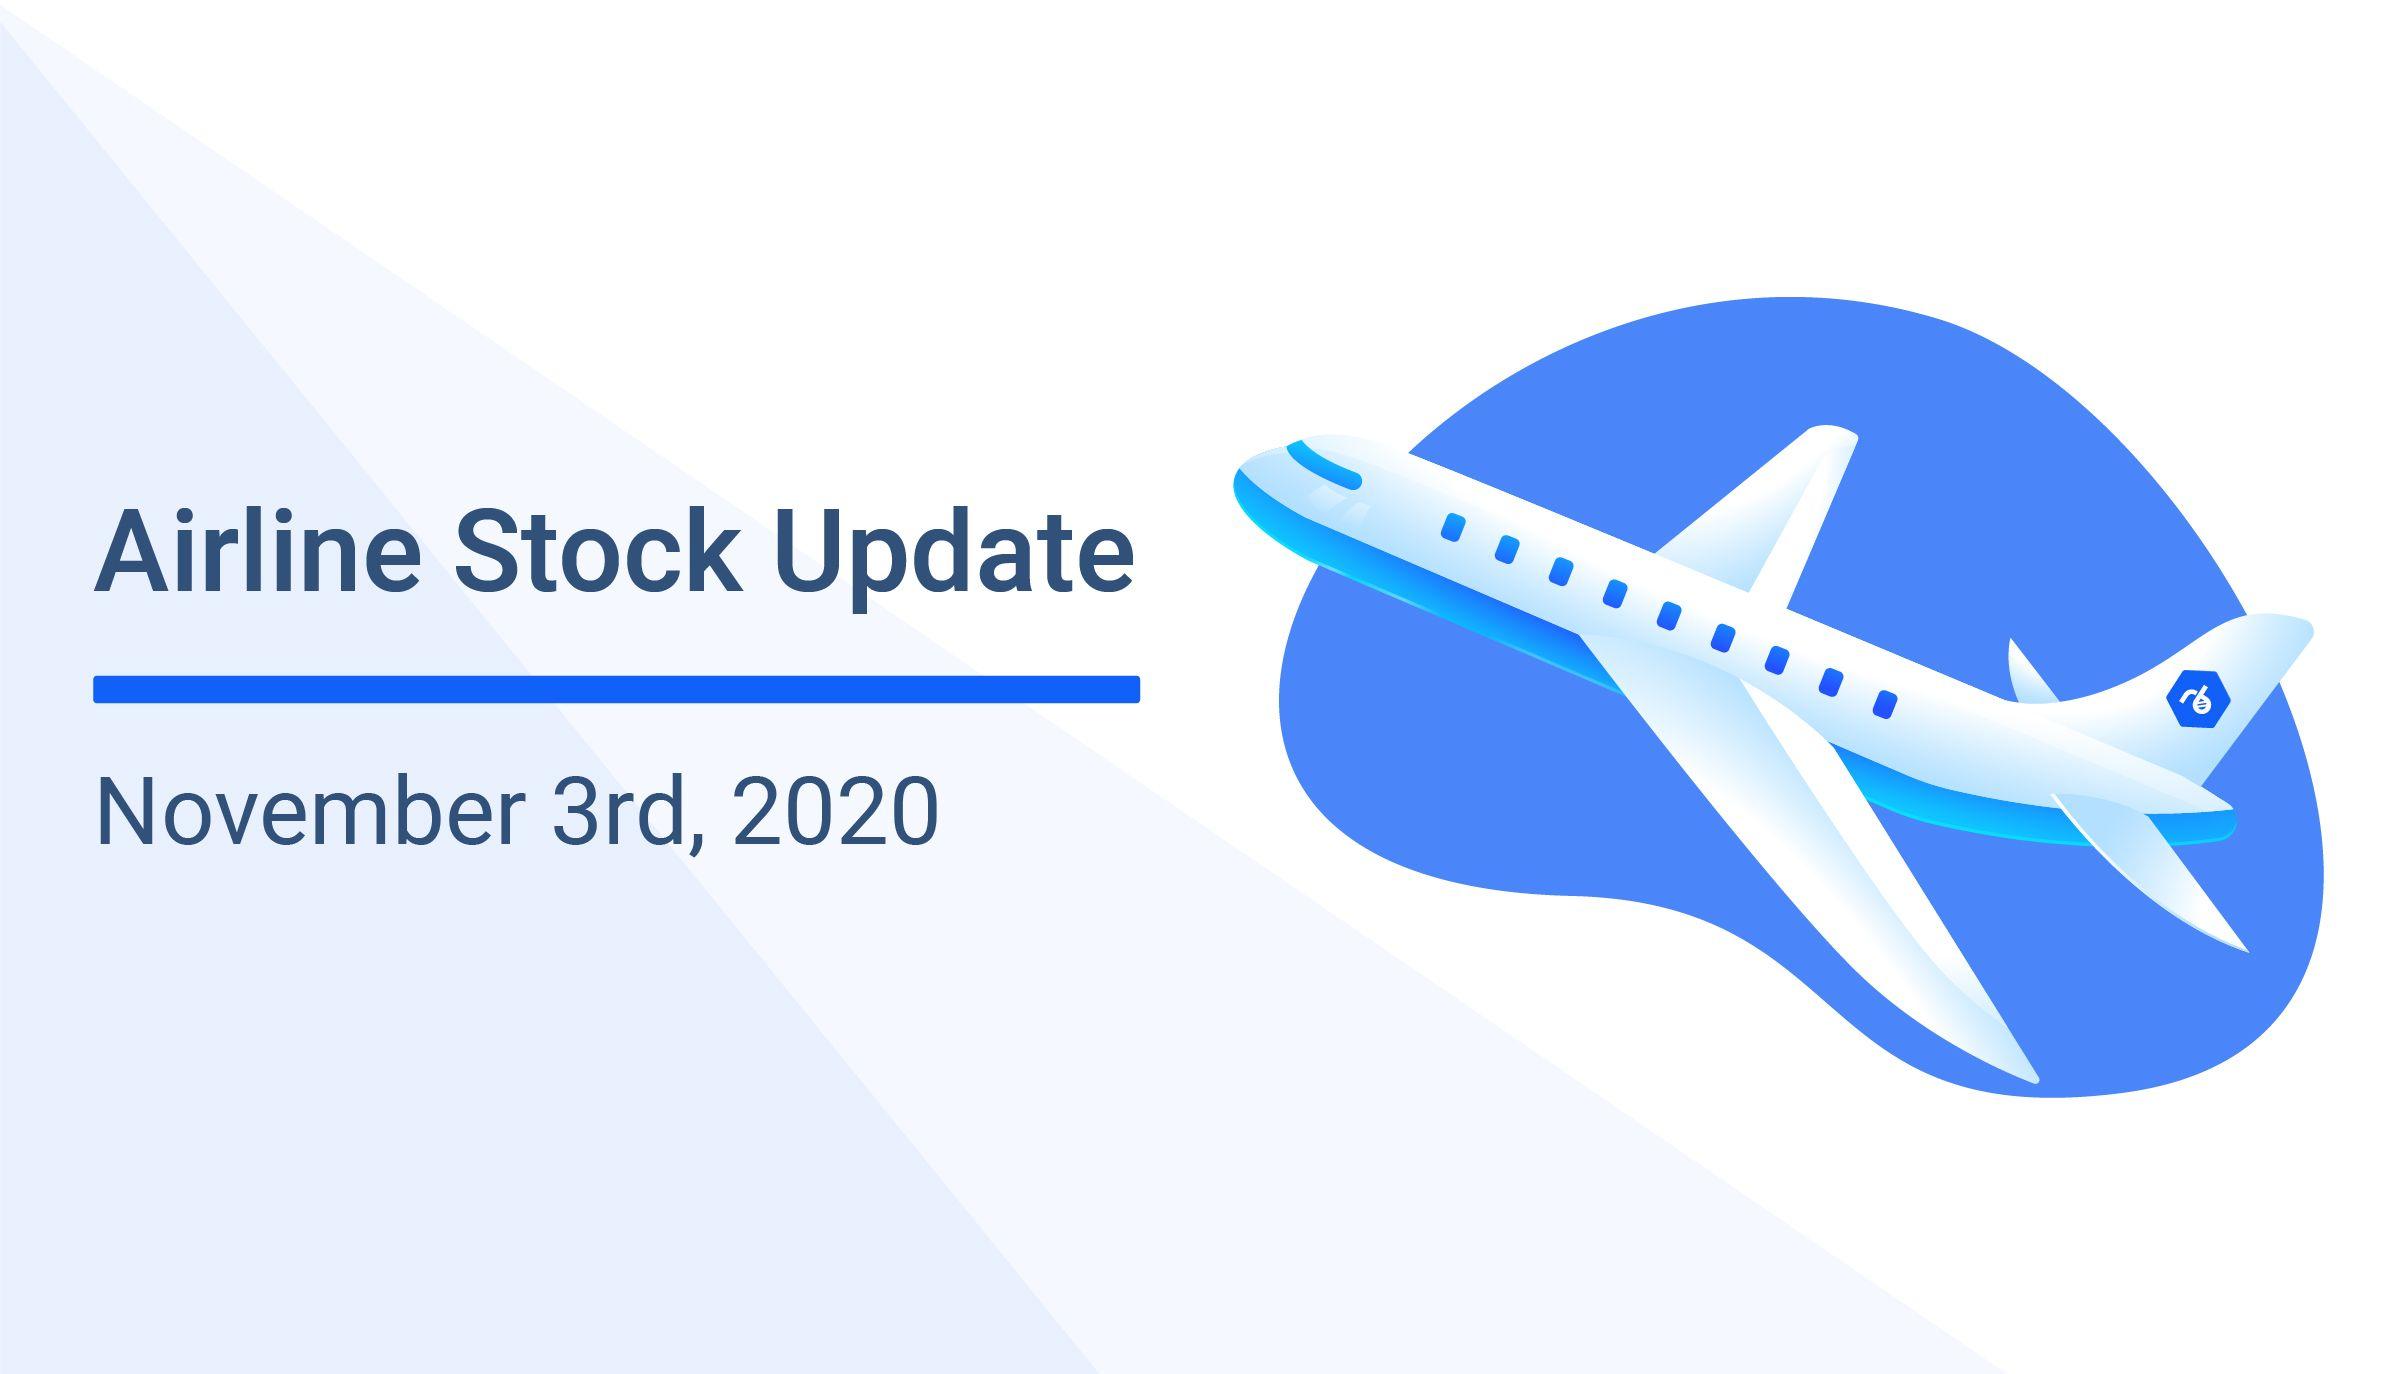 Airline Stock Update - November 3rd, 2020